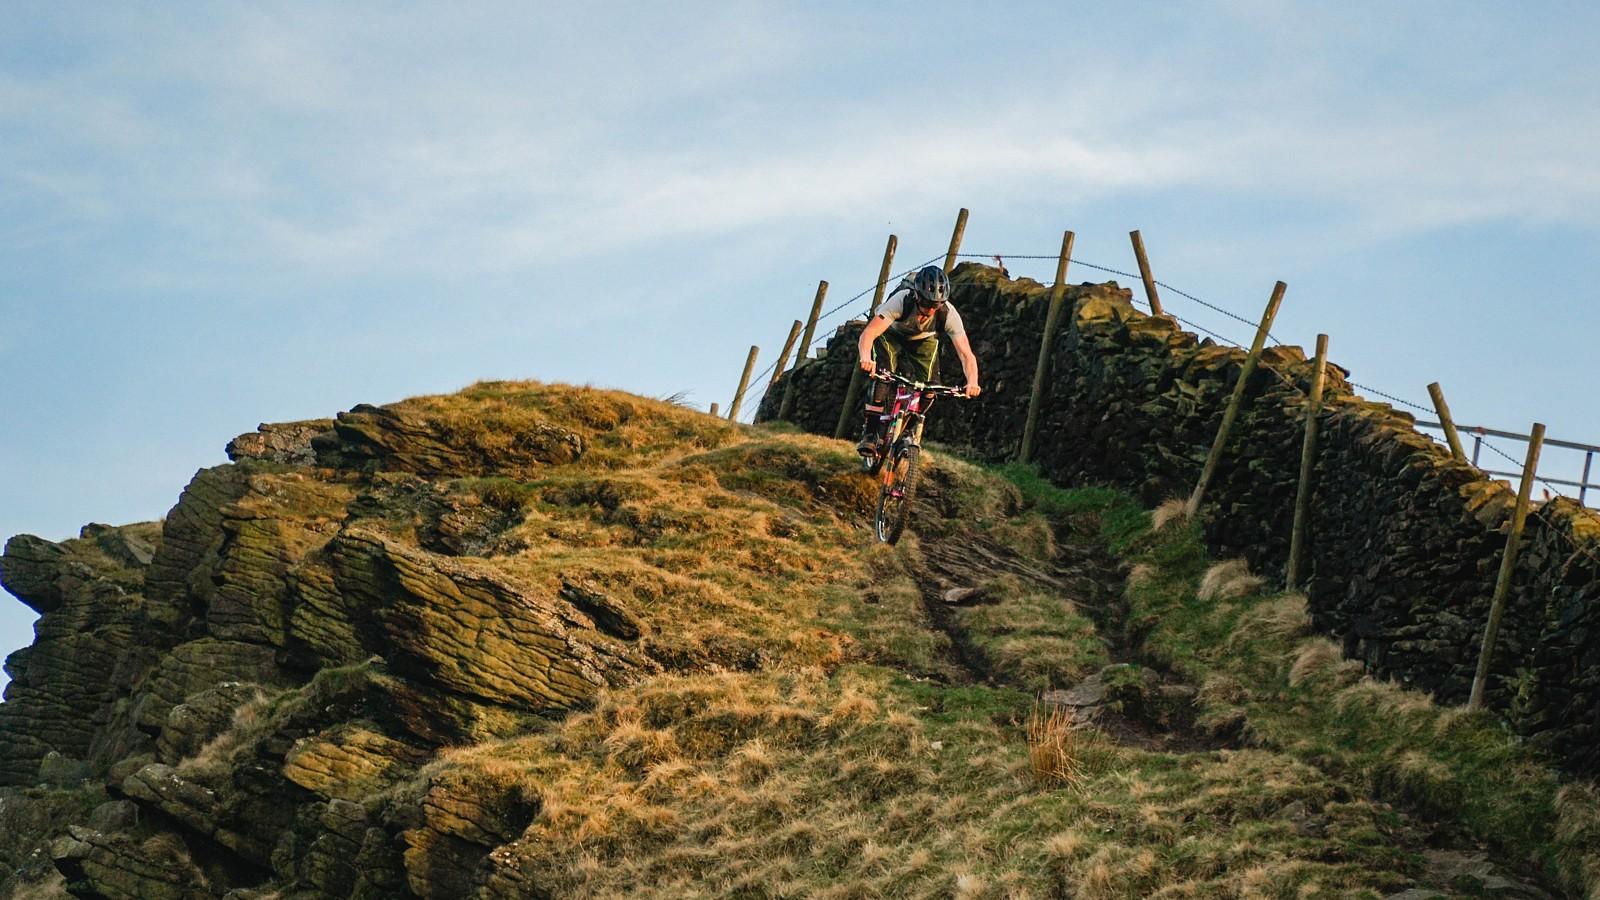 DSC09288 (2) - Mushrum - Mountain Biking Pictures - Vital MTB